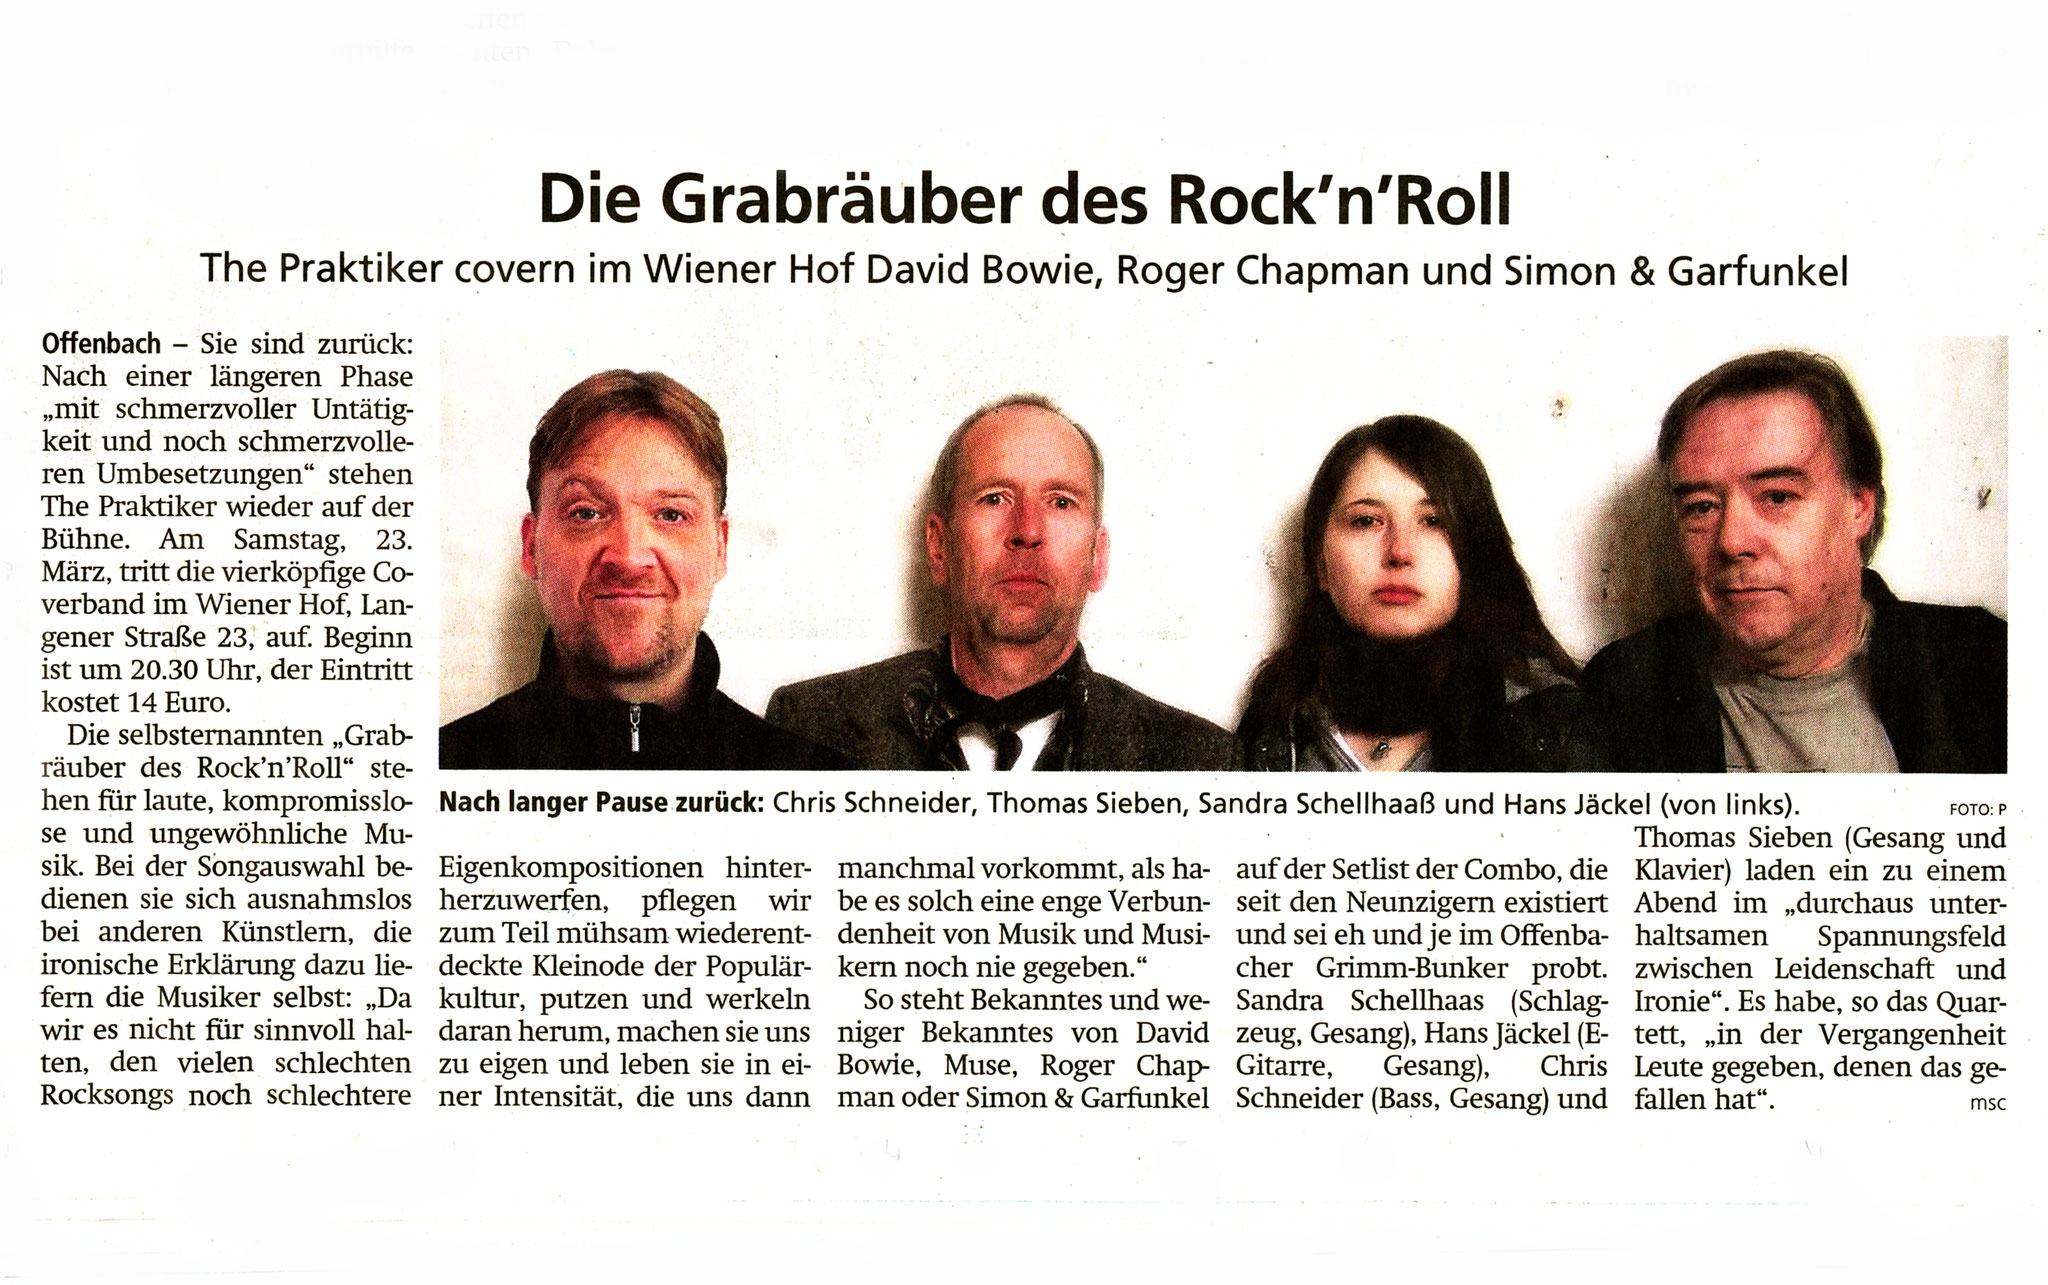 Offenbach Post, 21. März 2019